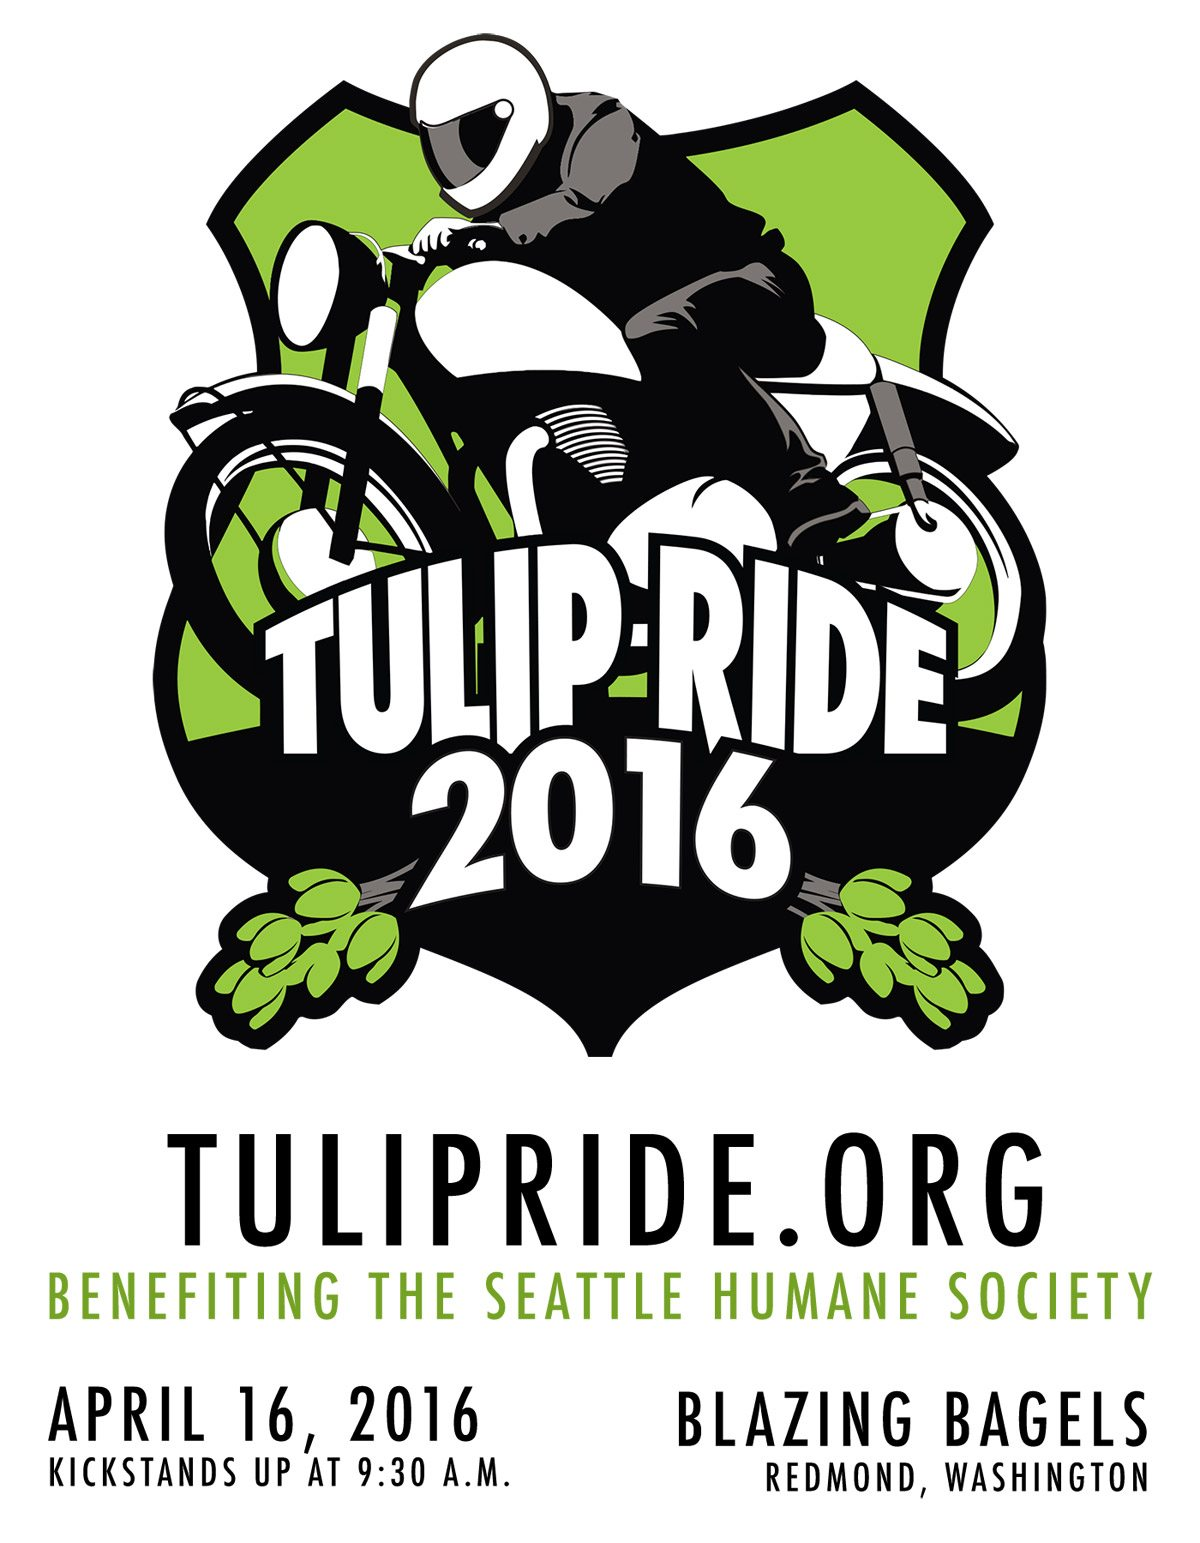 TulipRide2016-Main